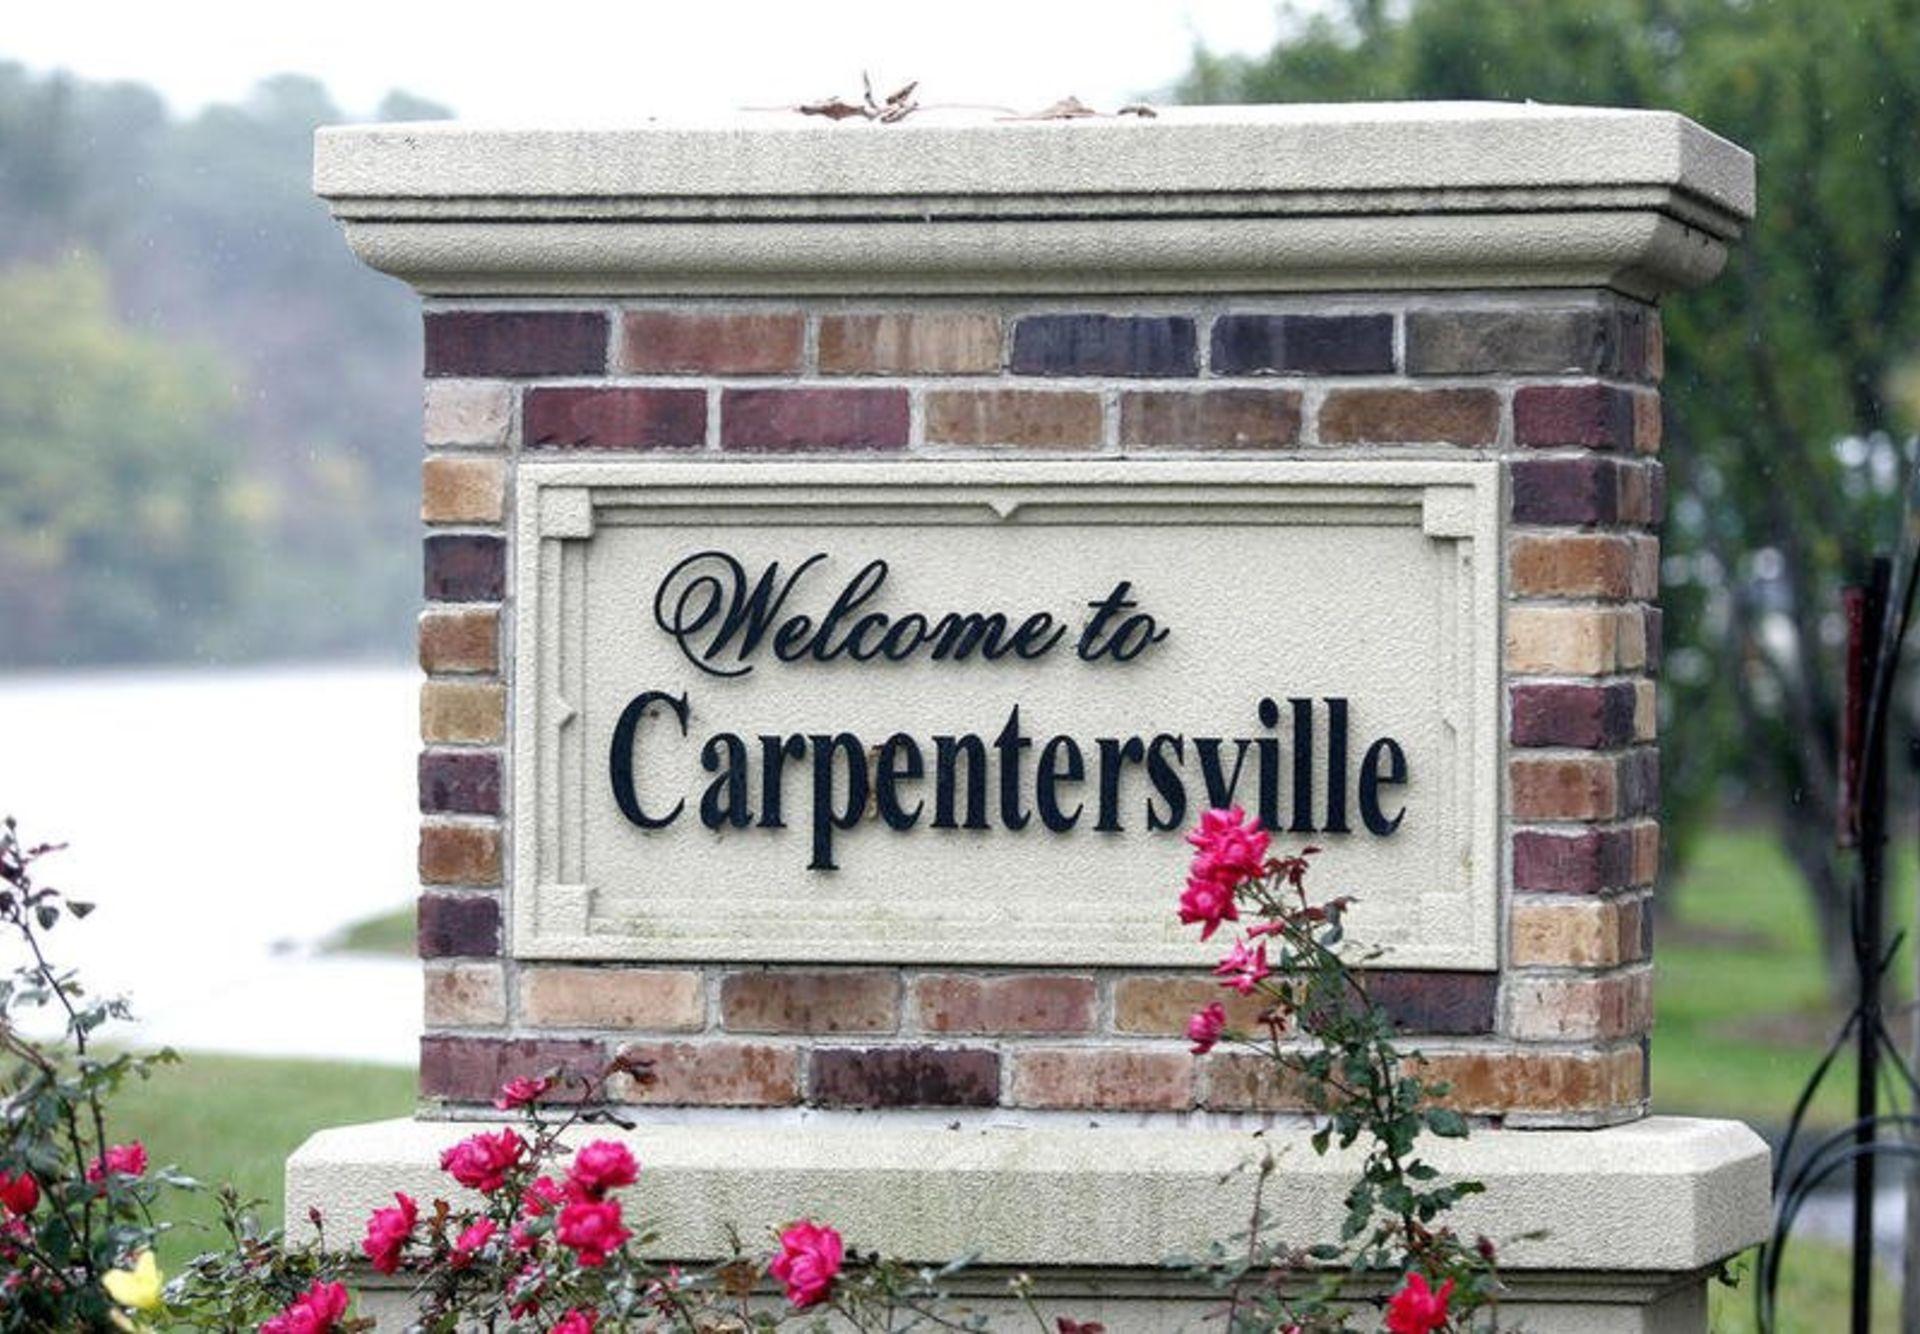 Carpentersville